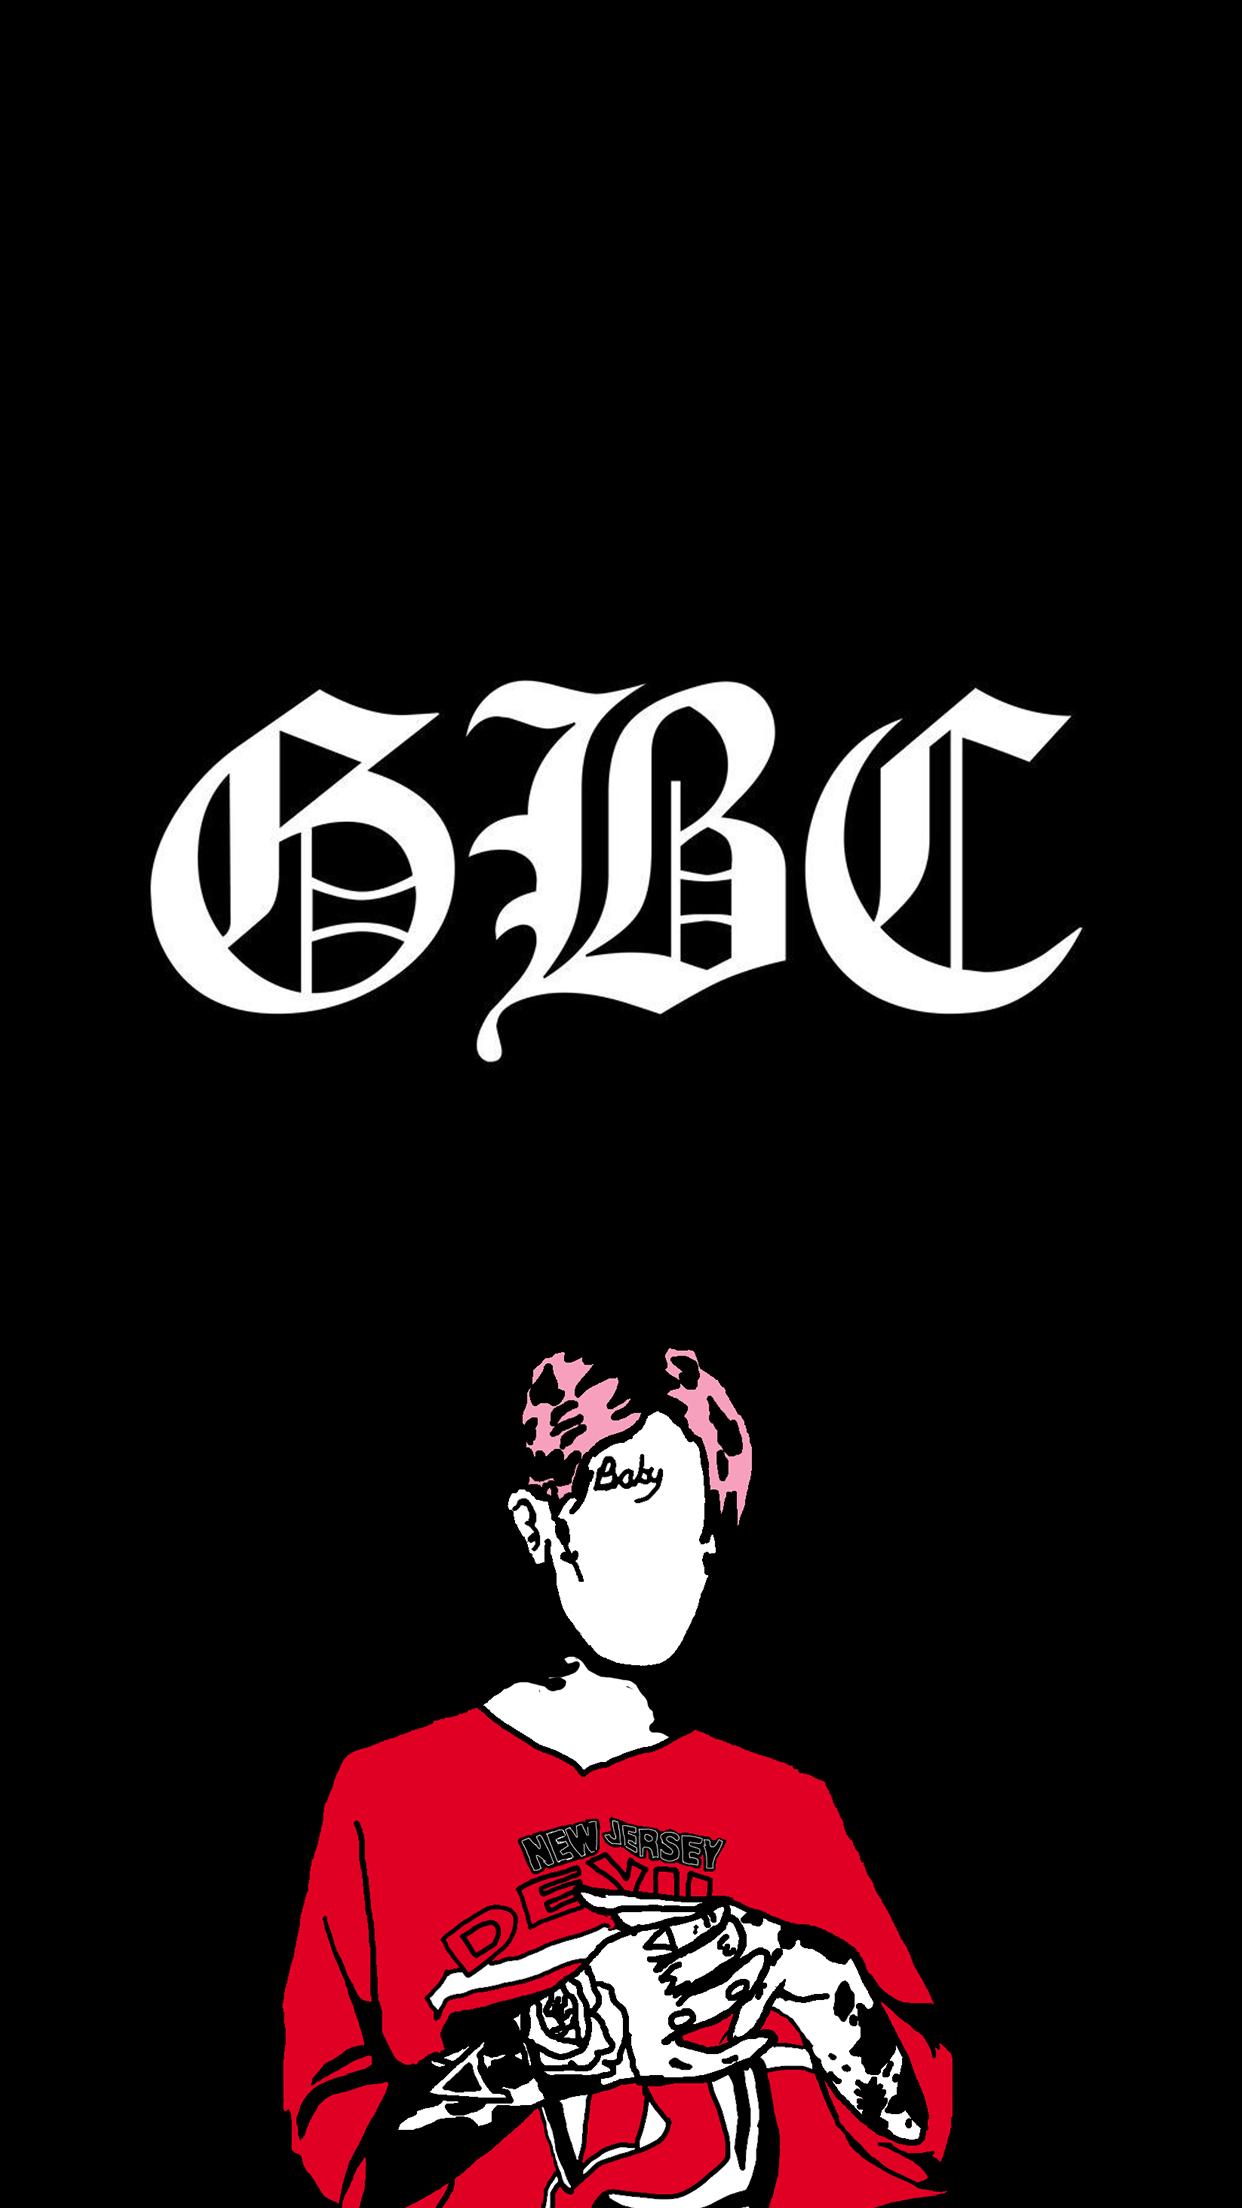 40+ Lil Peep Wallpapers Download at WallpaperBro in 2020